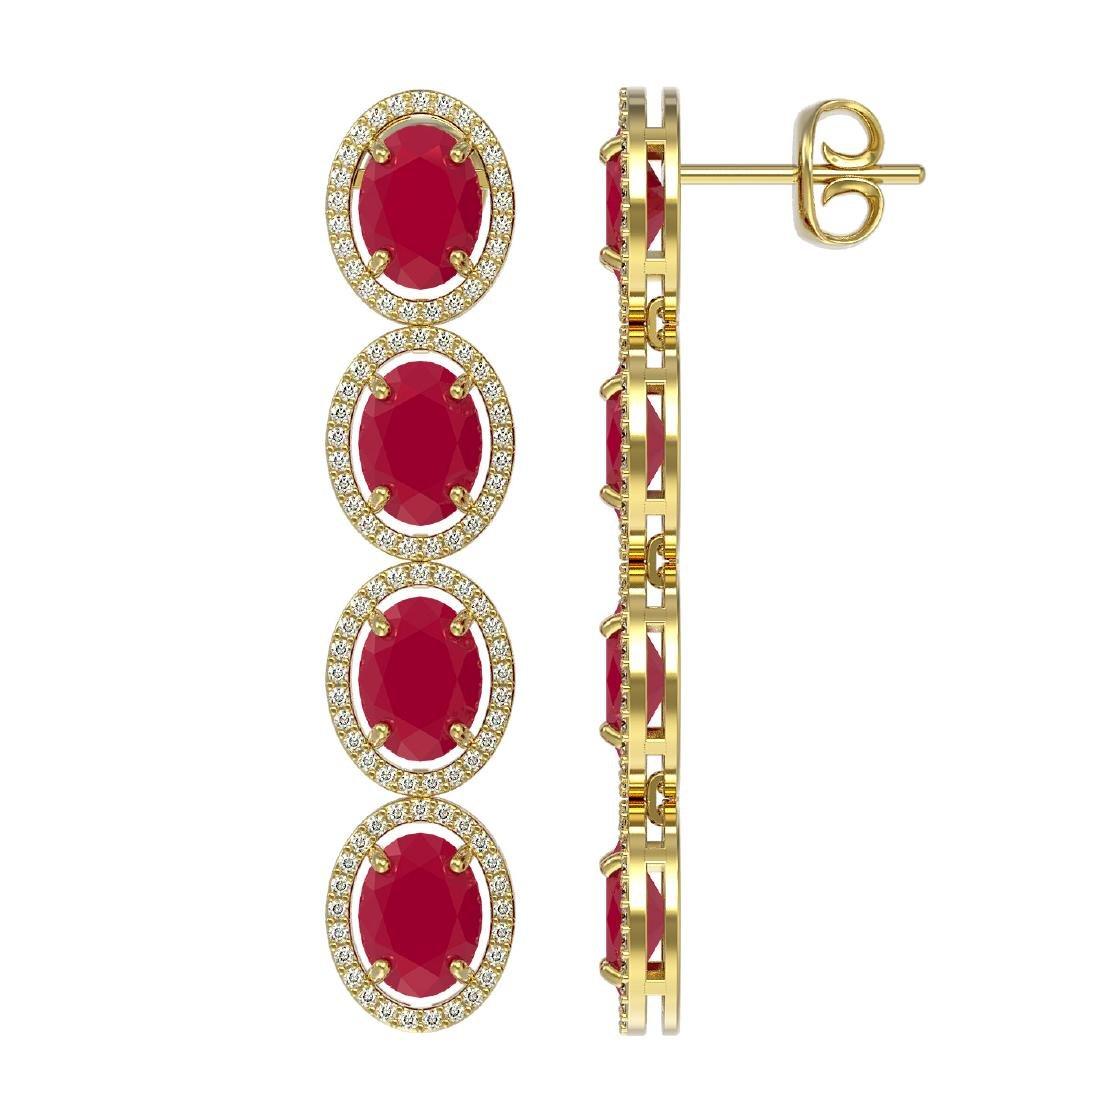 15.68 CTW Ruby & Diamond Halo Earrings 10K Yellow Gold - 2